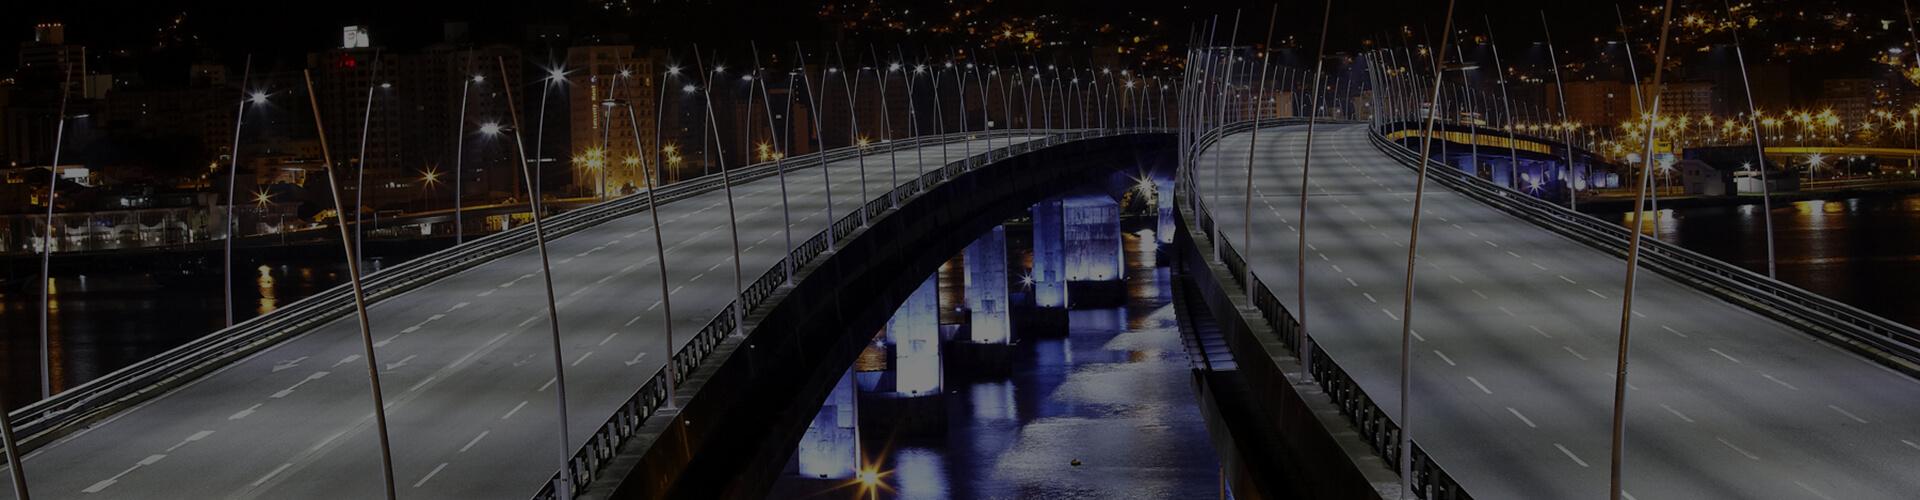 FLORIANÓPOLIS - LED - PONTES - FOT. ADRIANO AMARO